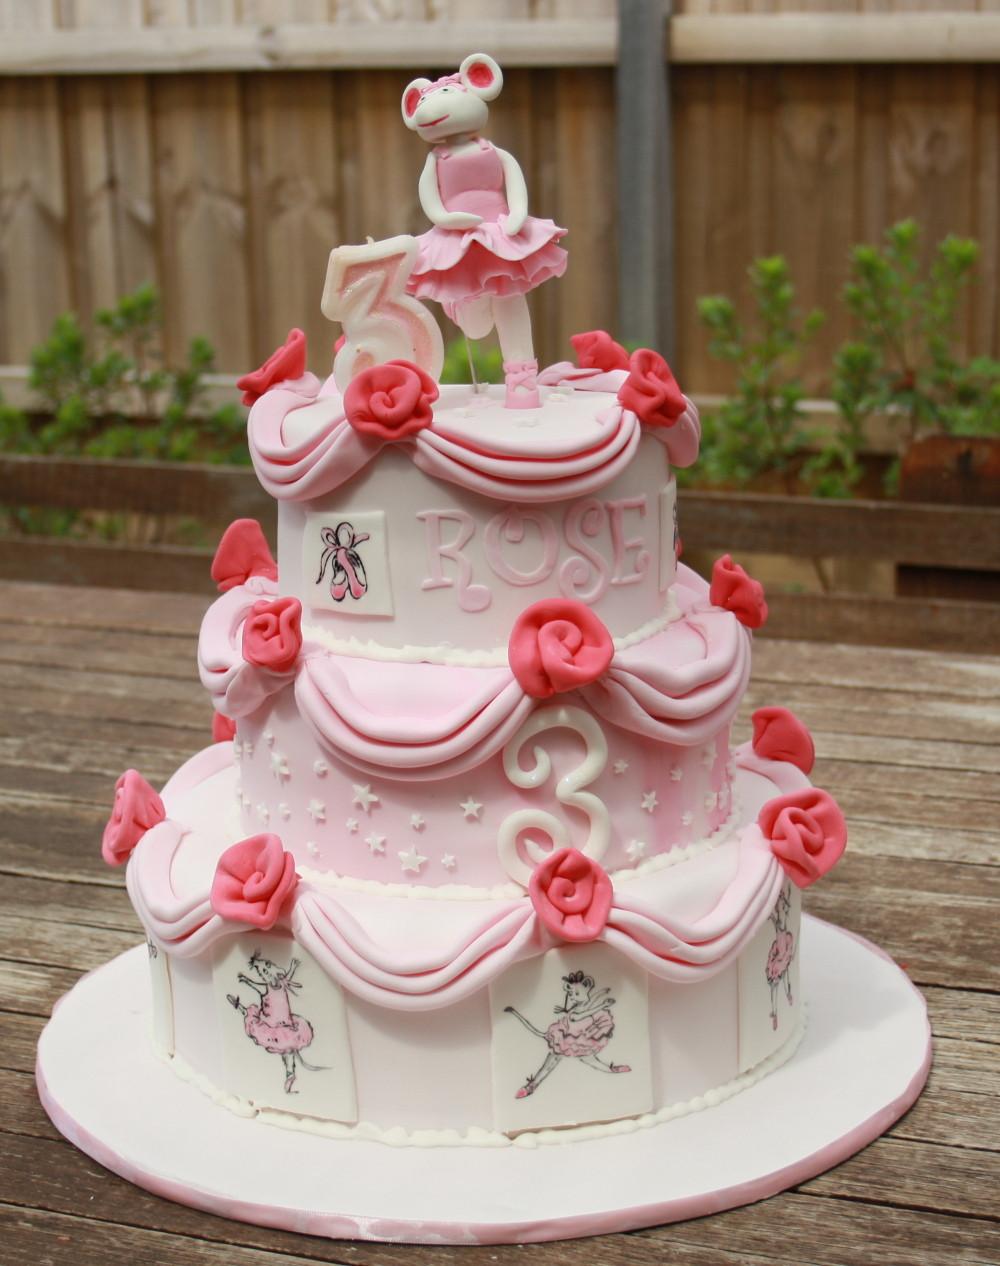 Best ideas about Ballerina Birthday Cake . Save or Pin Birthday Cake Angelina Ballerina Cake Now.